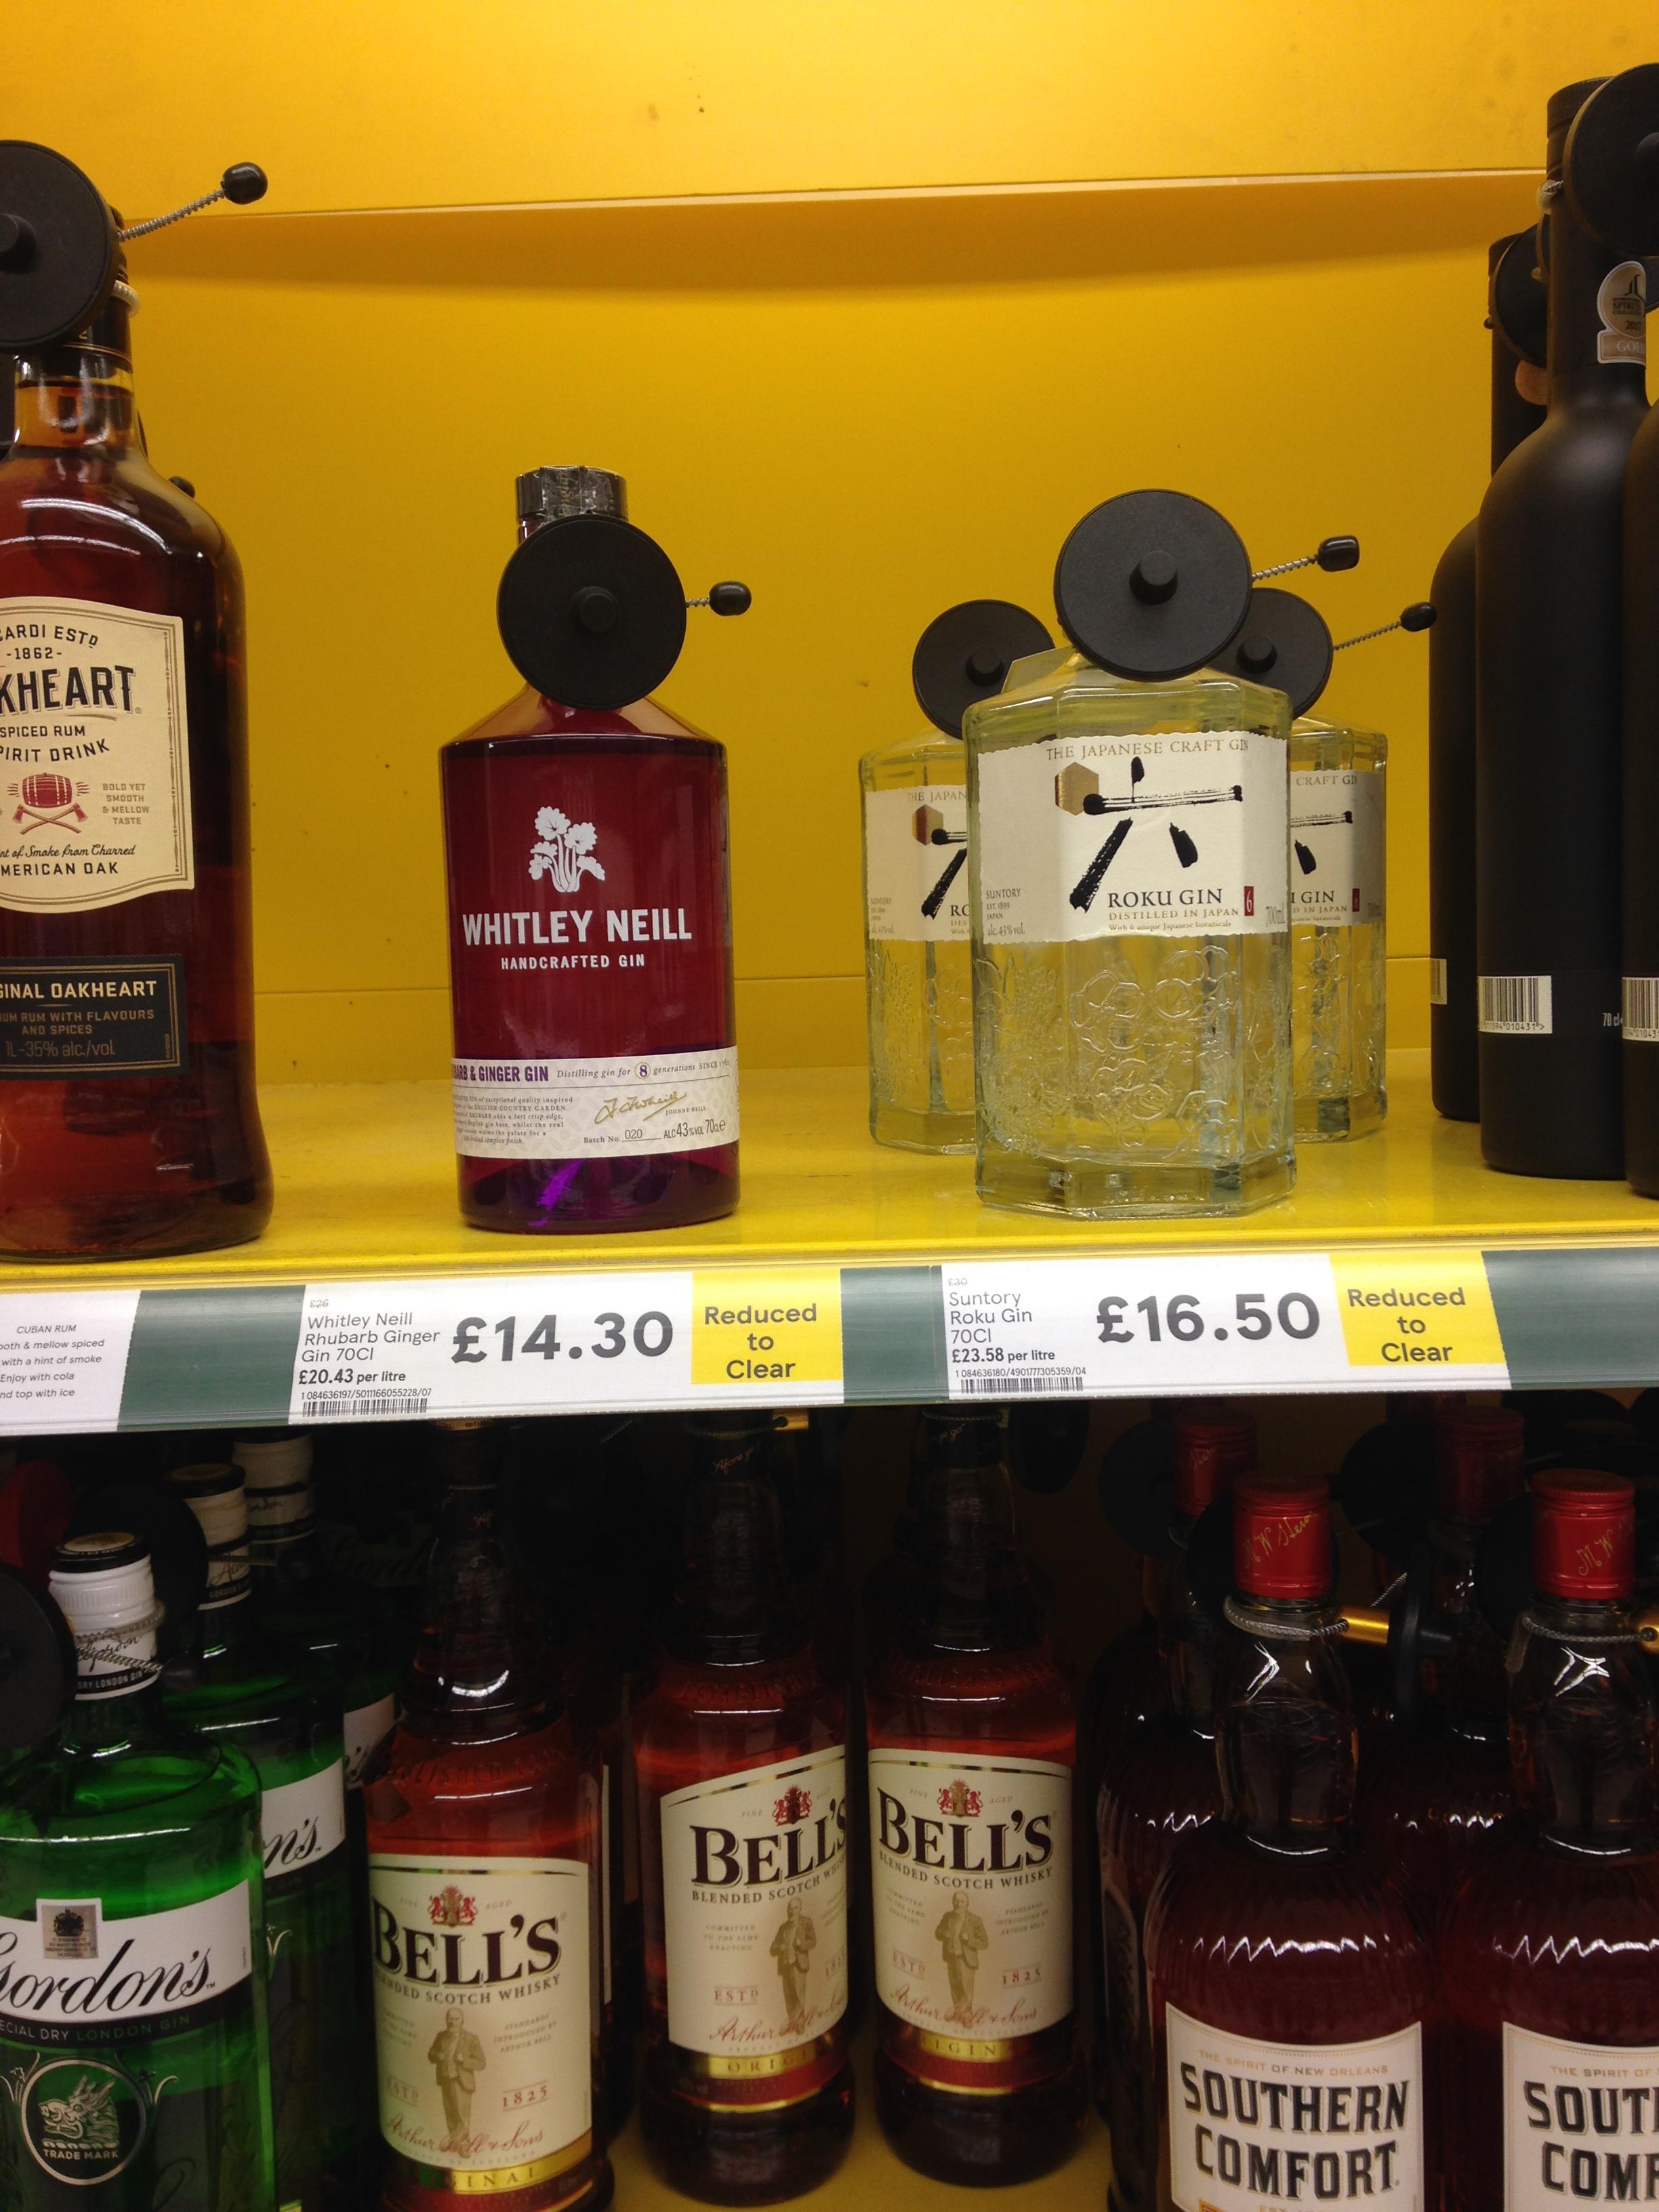 Suntory Roku gin 70cl £16.50 reduced to clear tesco